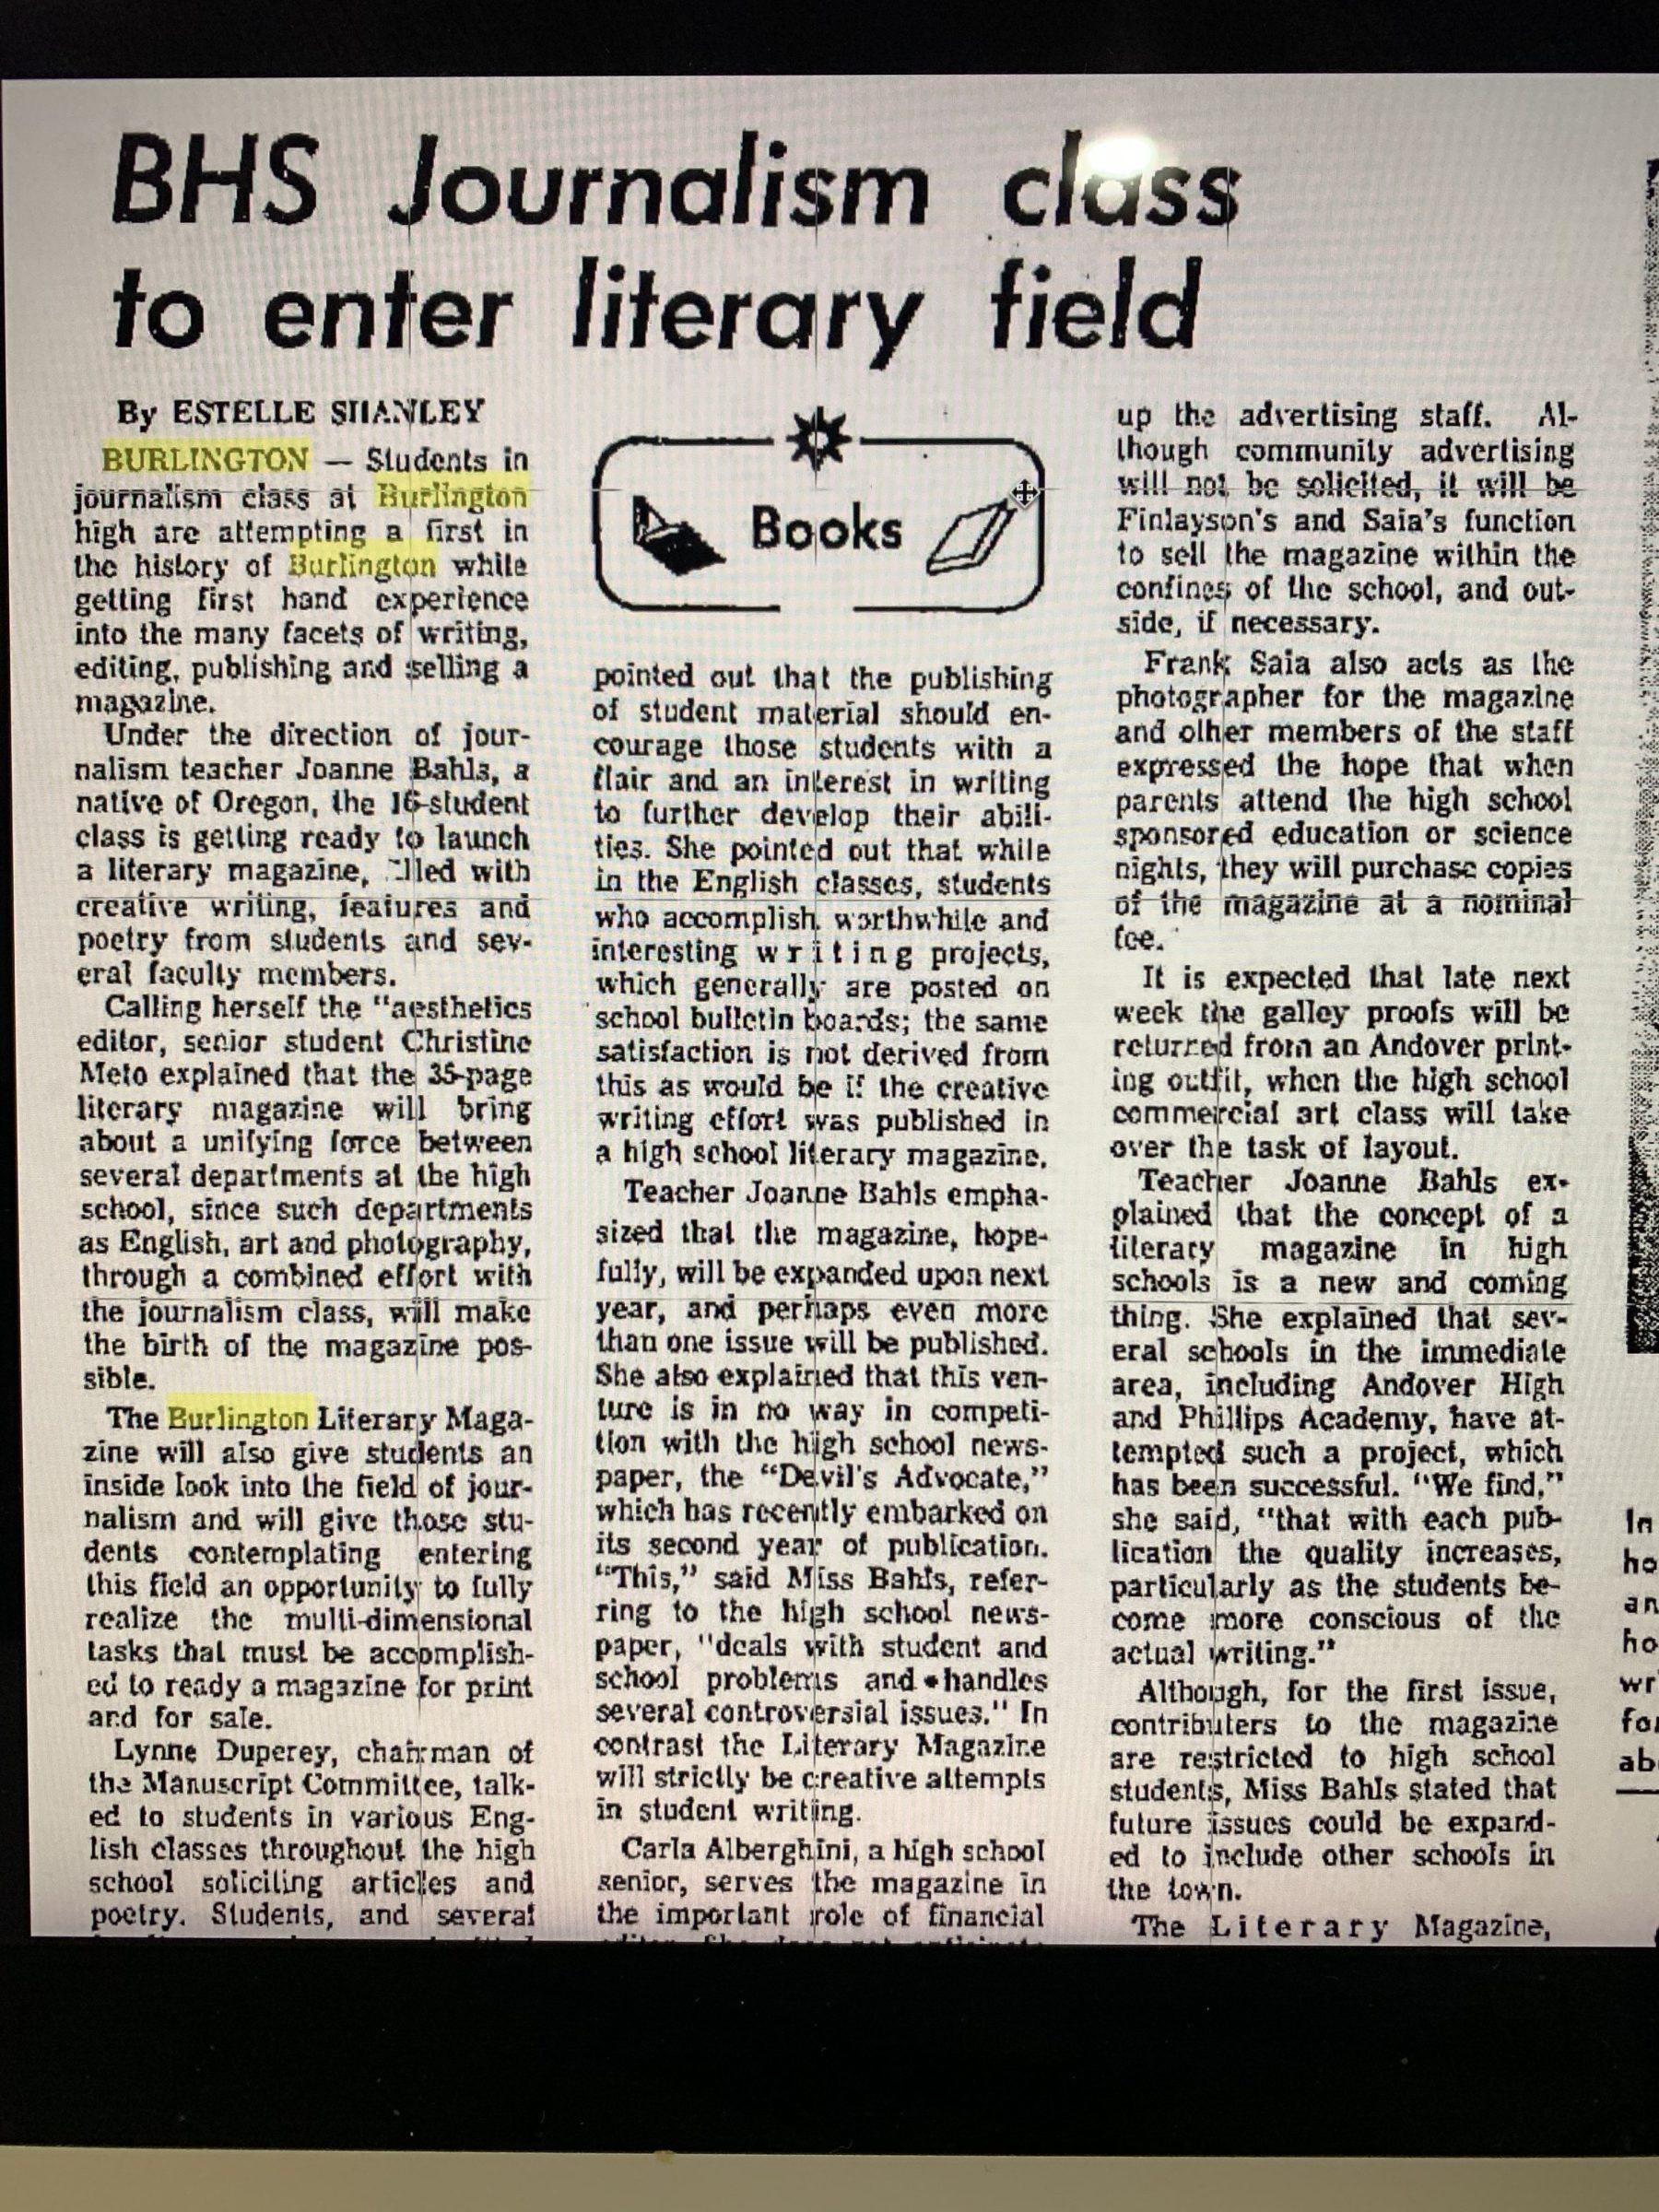 BHS literary magazine 1970 Burlington MA